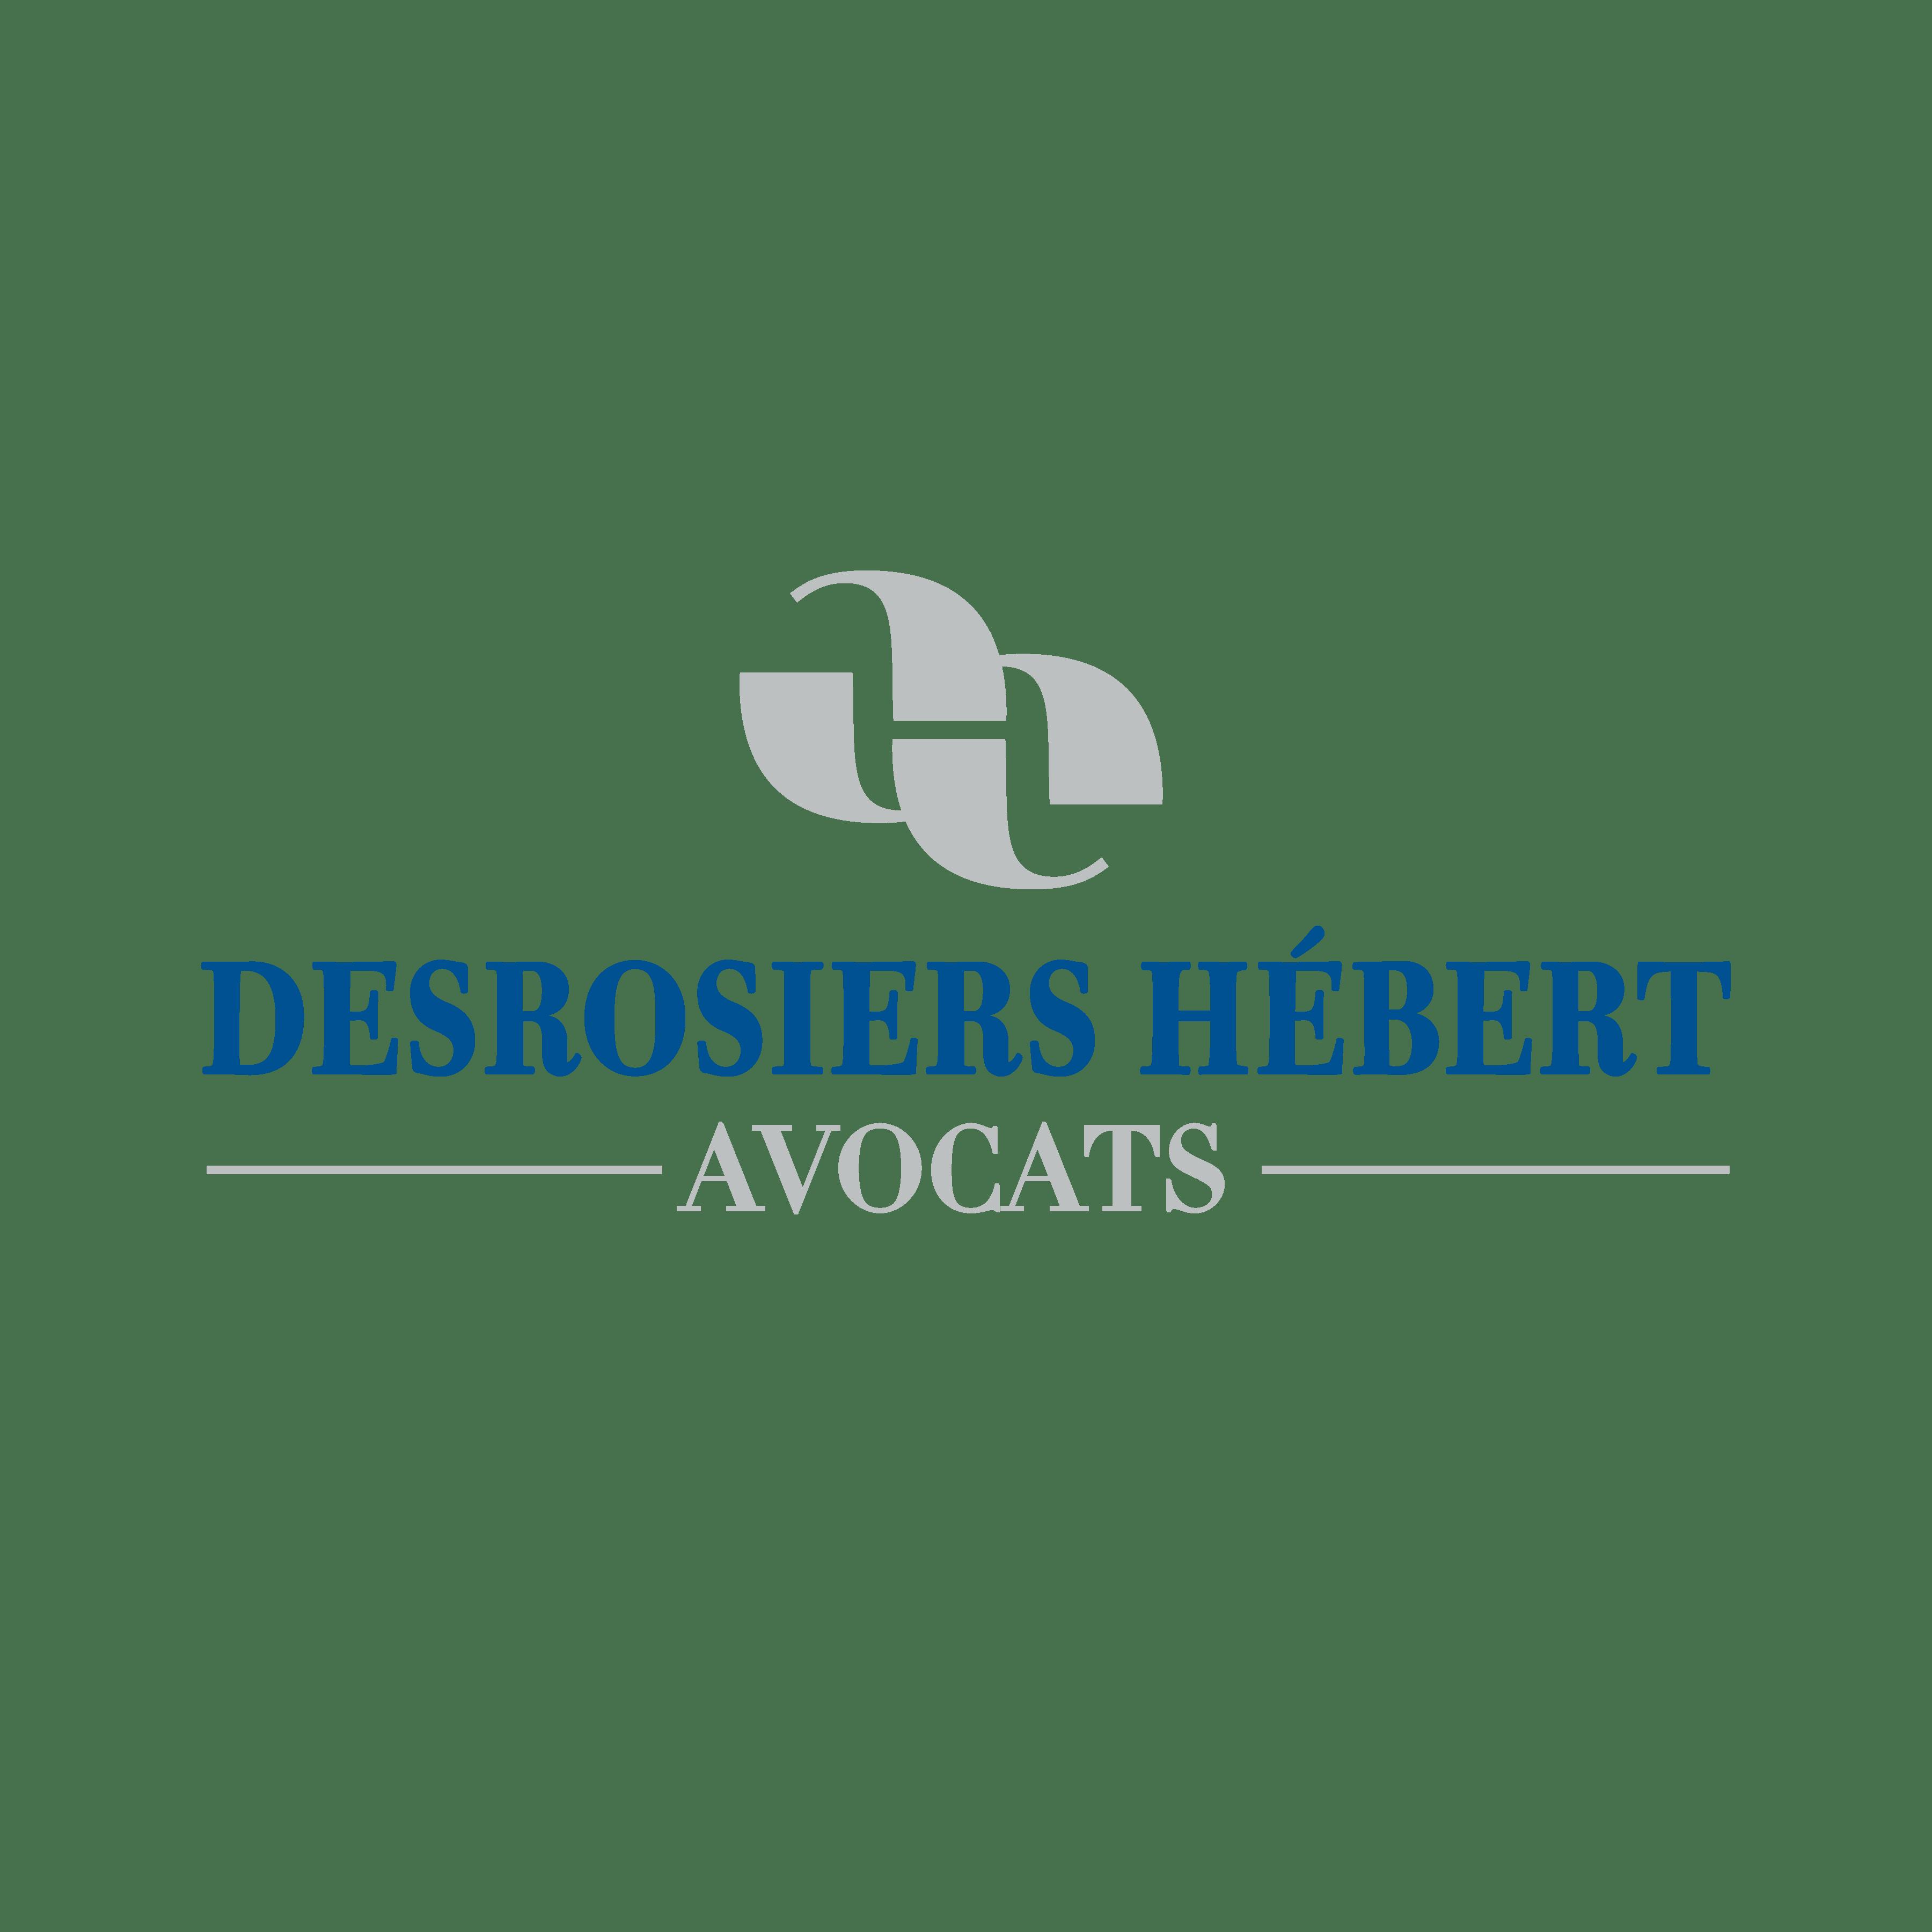 Logo Desrosiers-hebertavocat_logo_seul-01